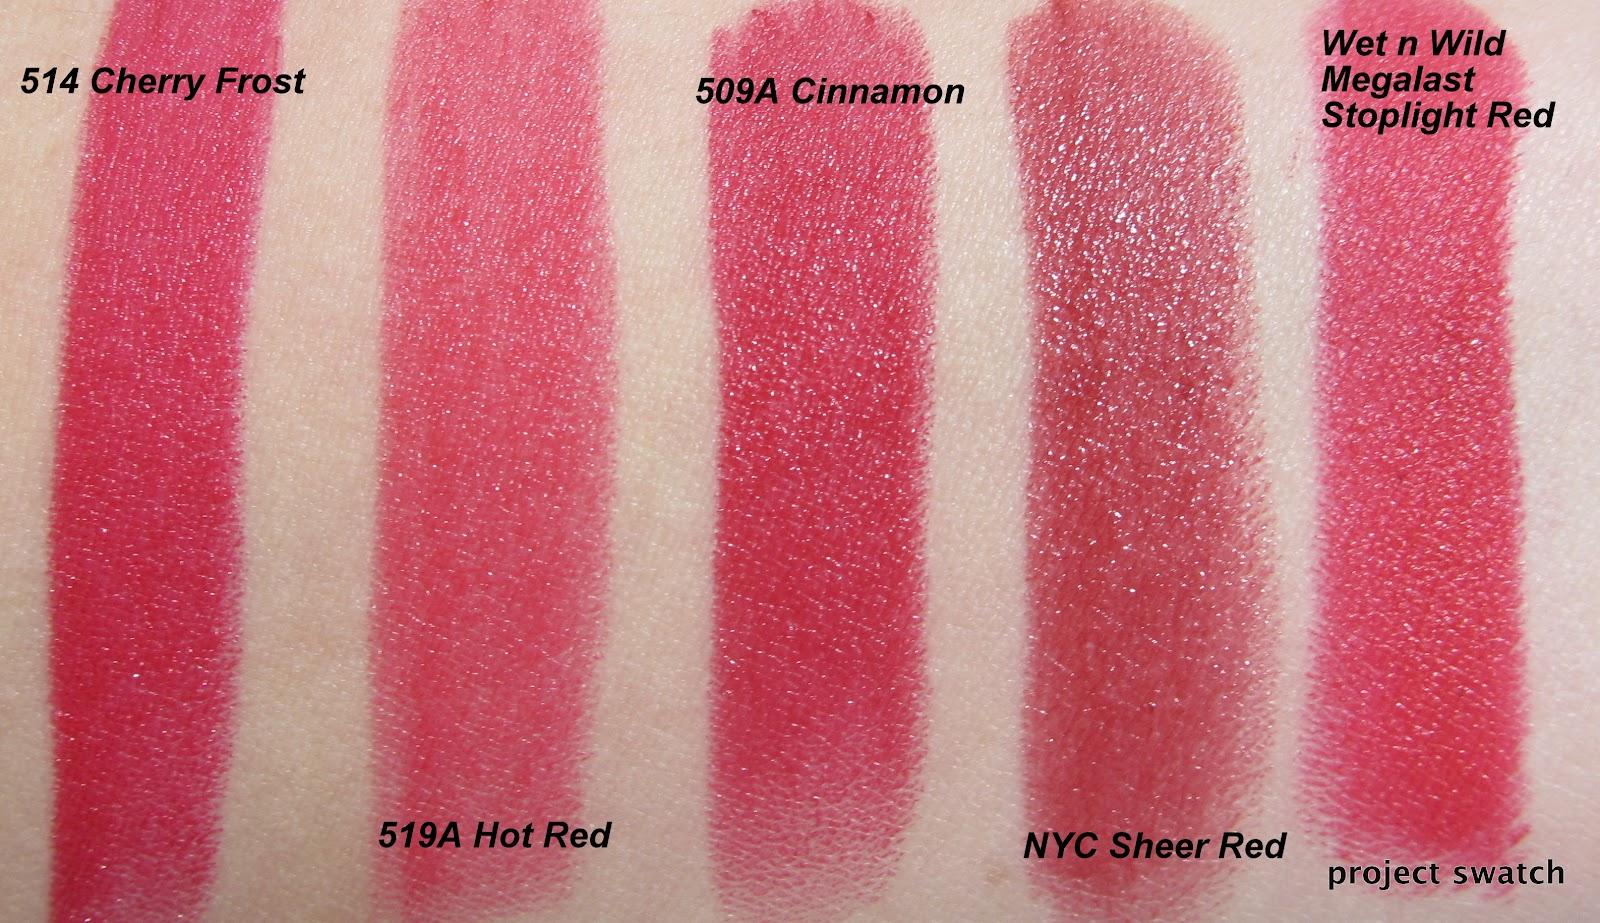 Wet n Wild Silk Finish Red Lipsticks Review, Swatches, Photos ...